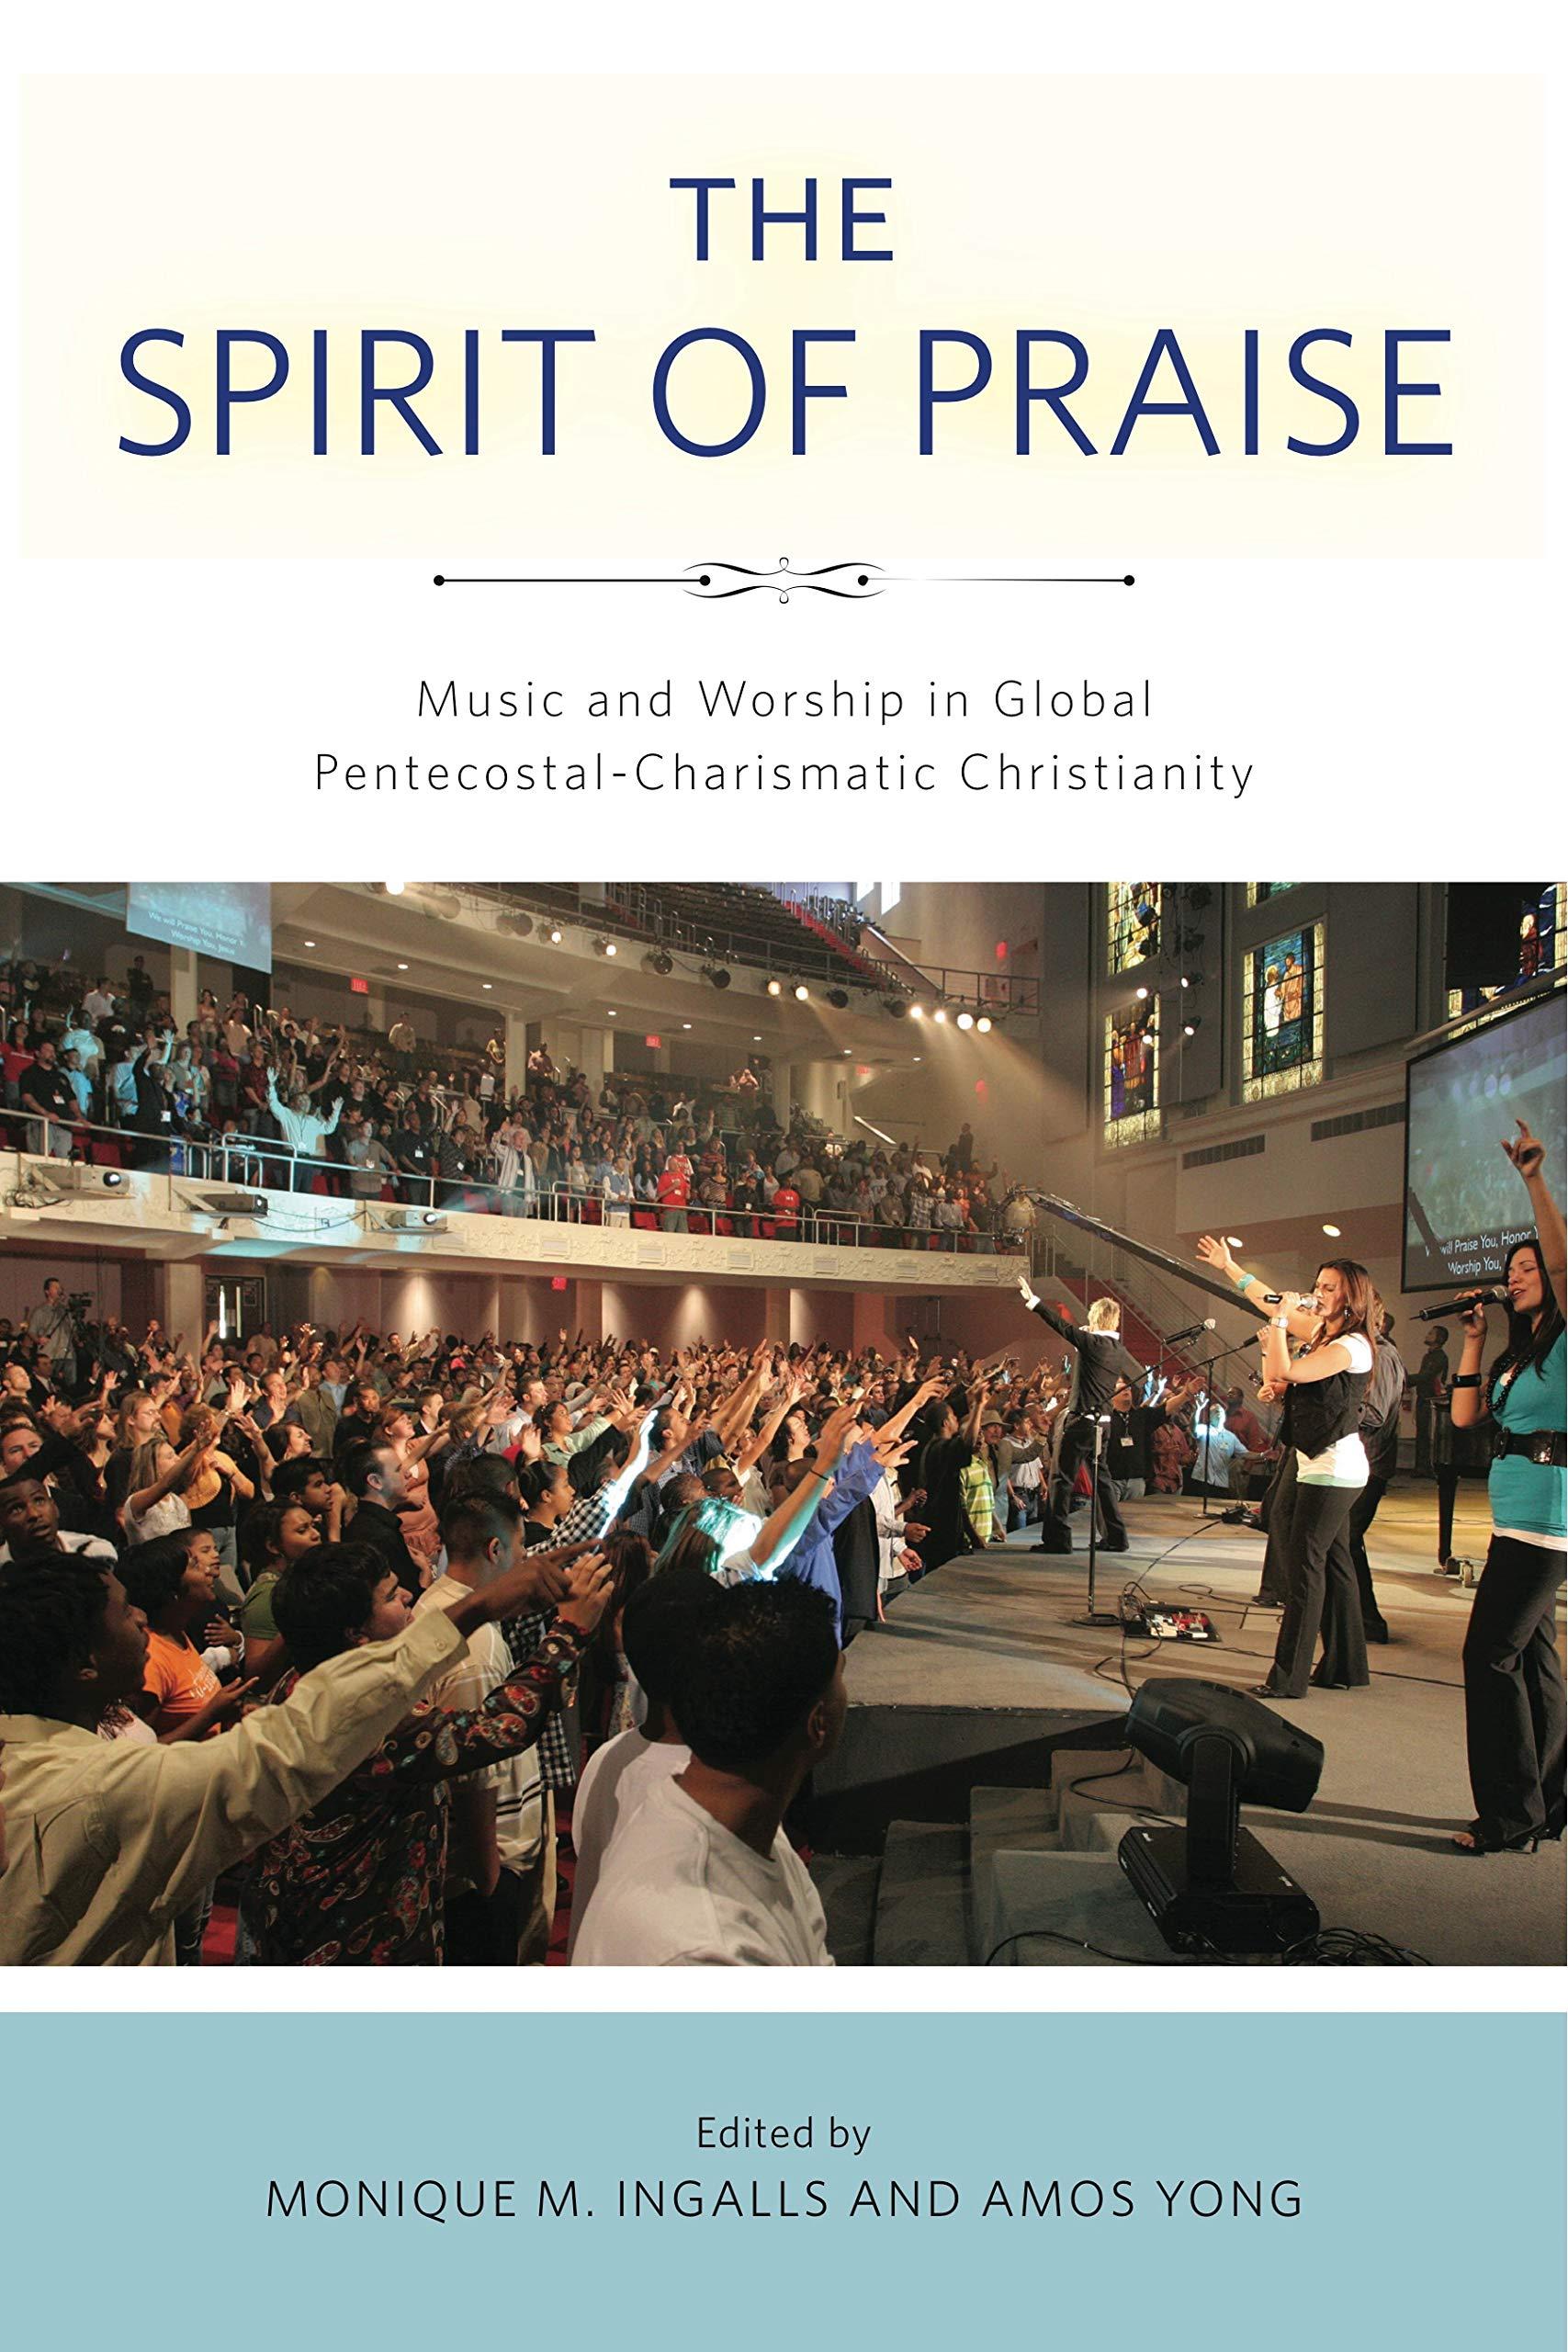 charismatic vs pentecostal